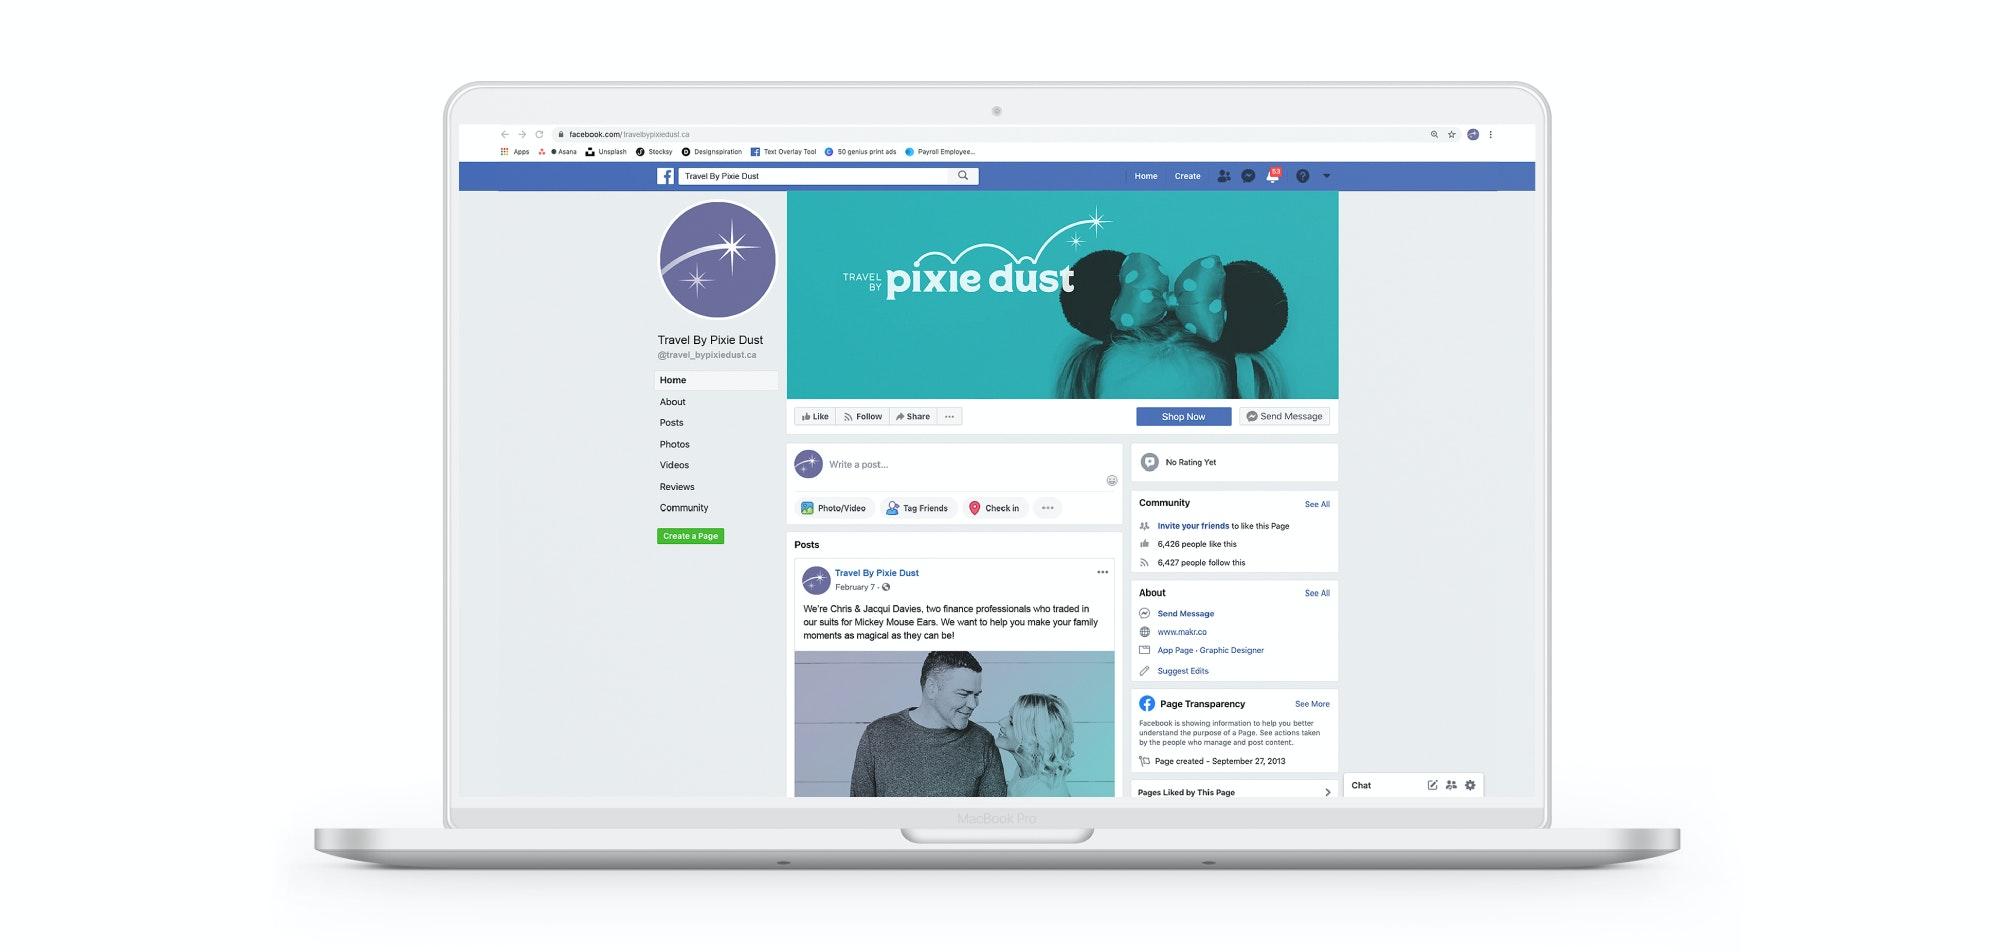 TBPD Facebook page design